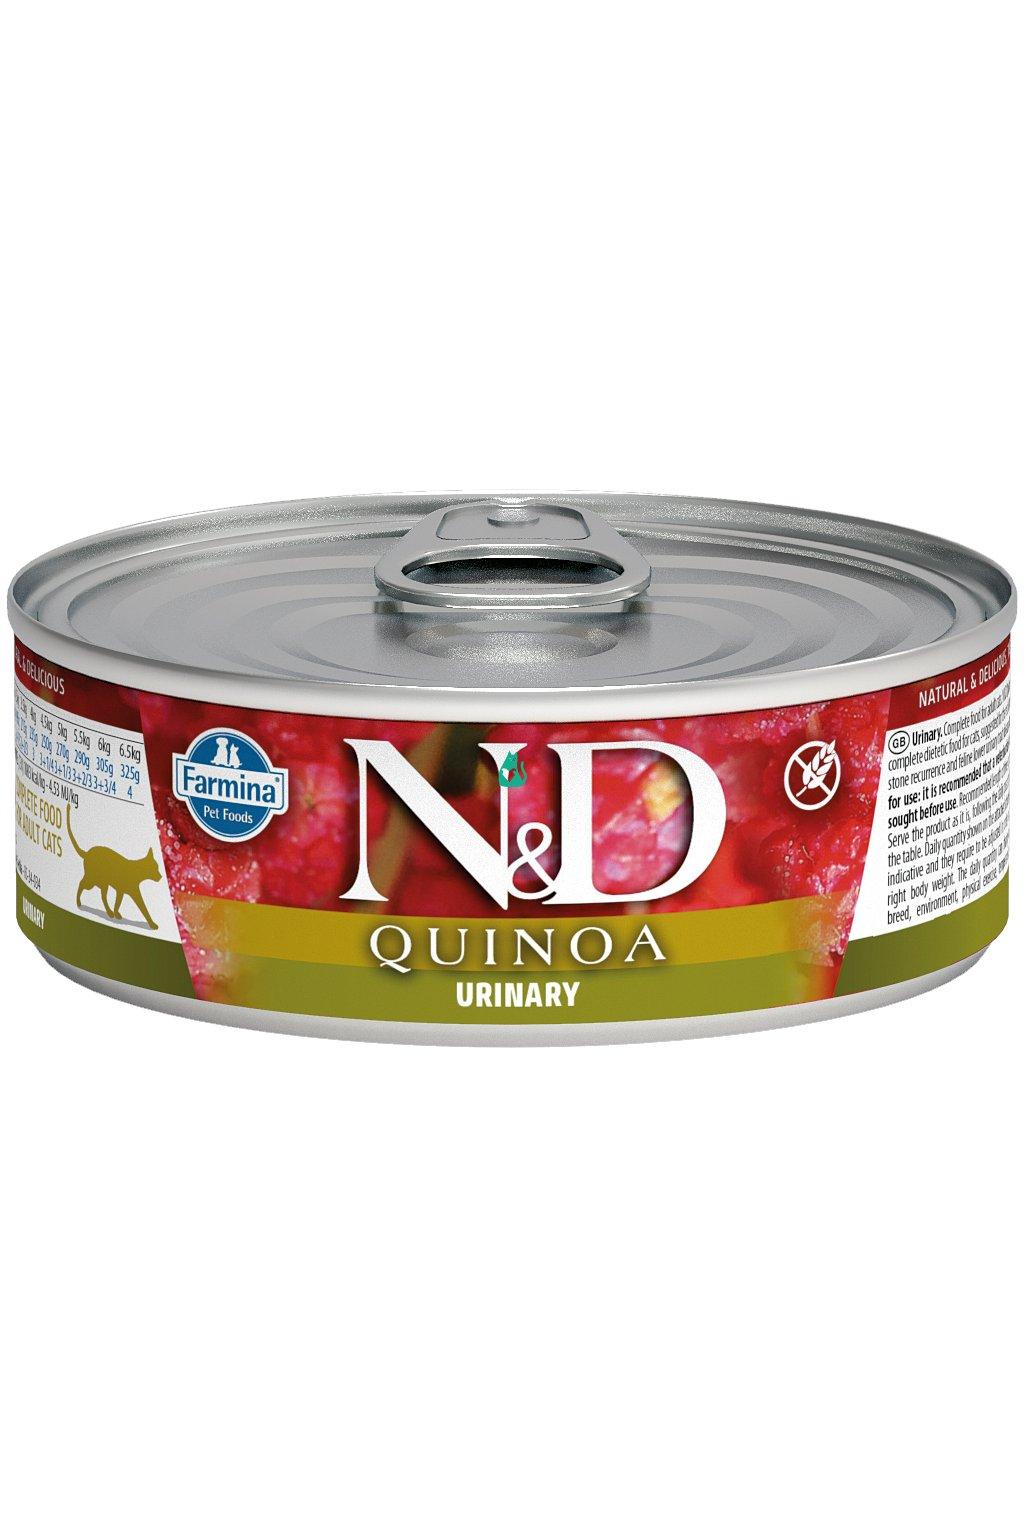 nd quinoa feline 80g URINARY@web